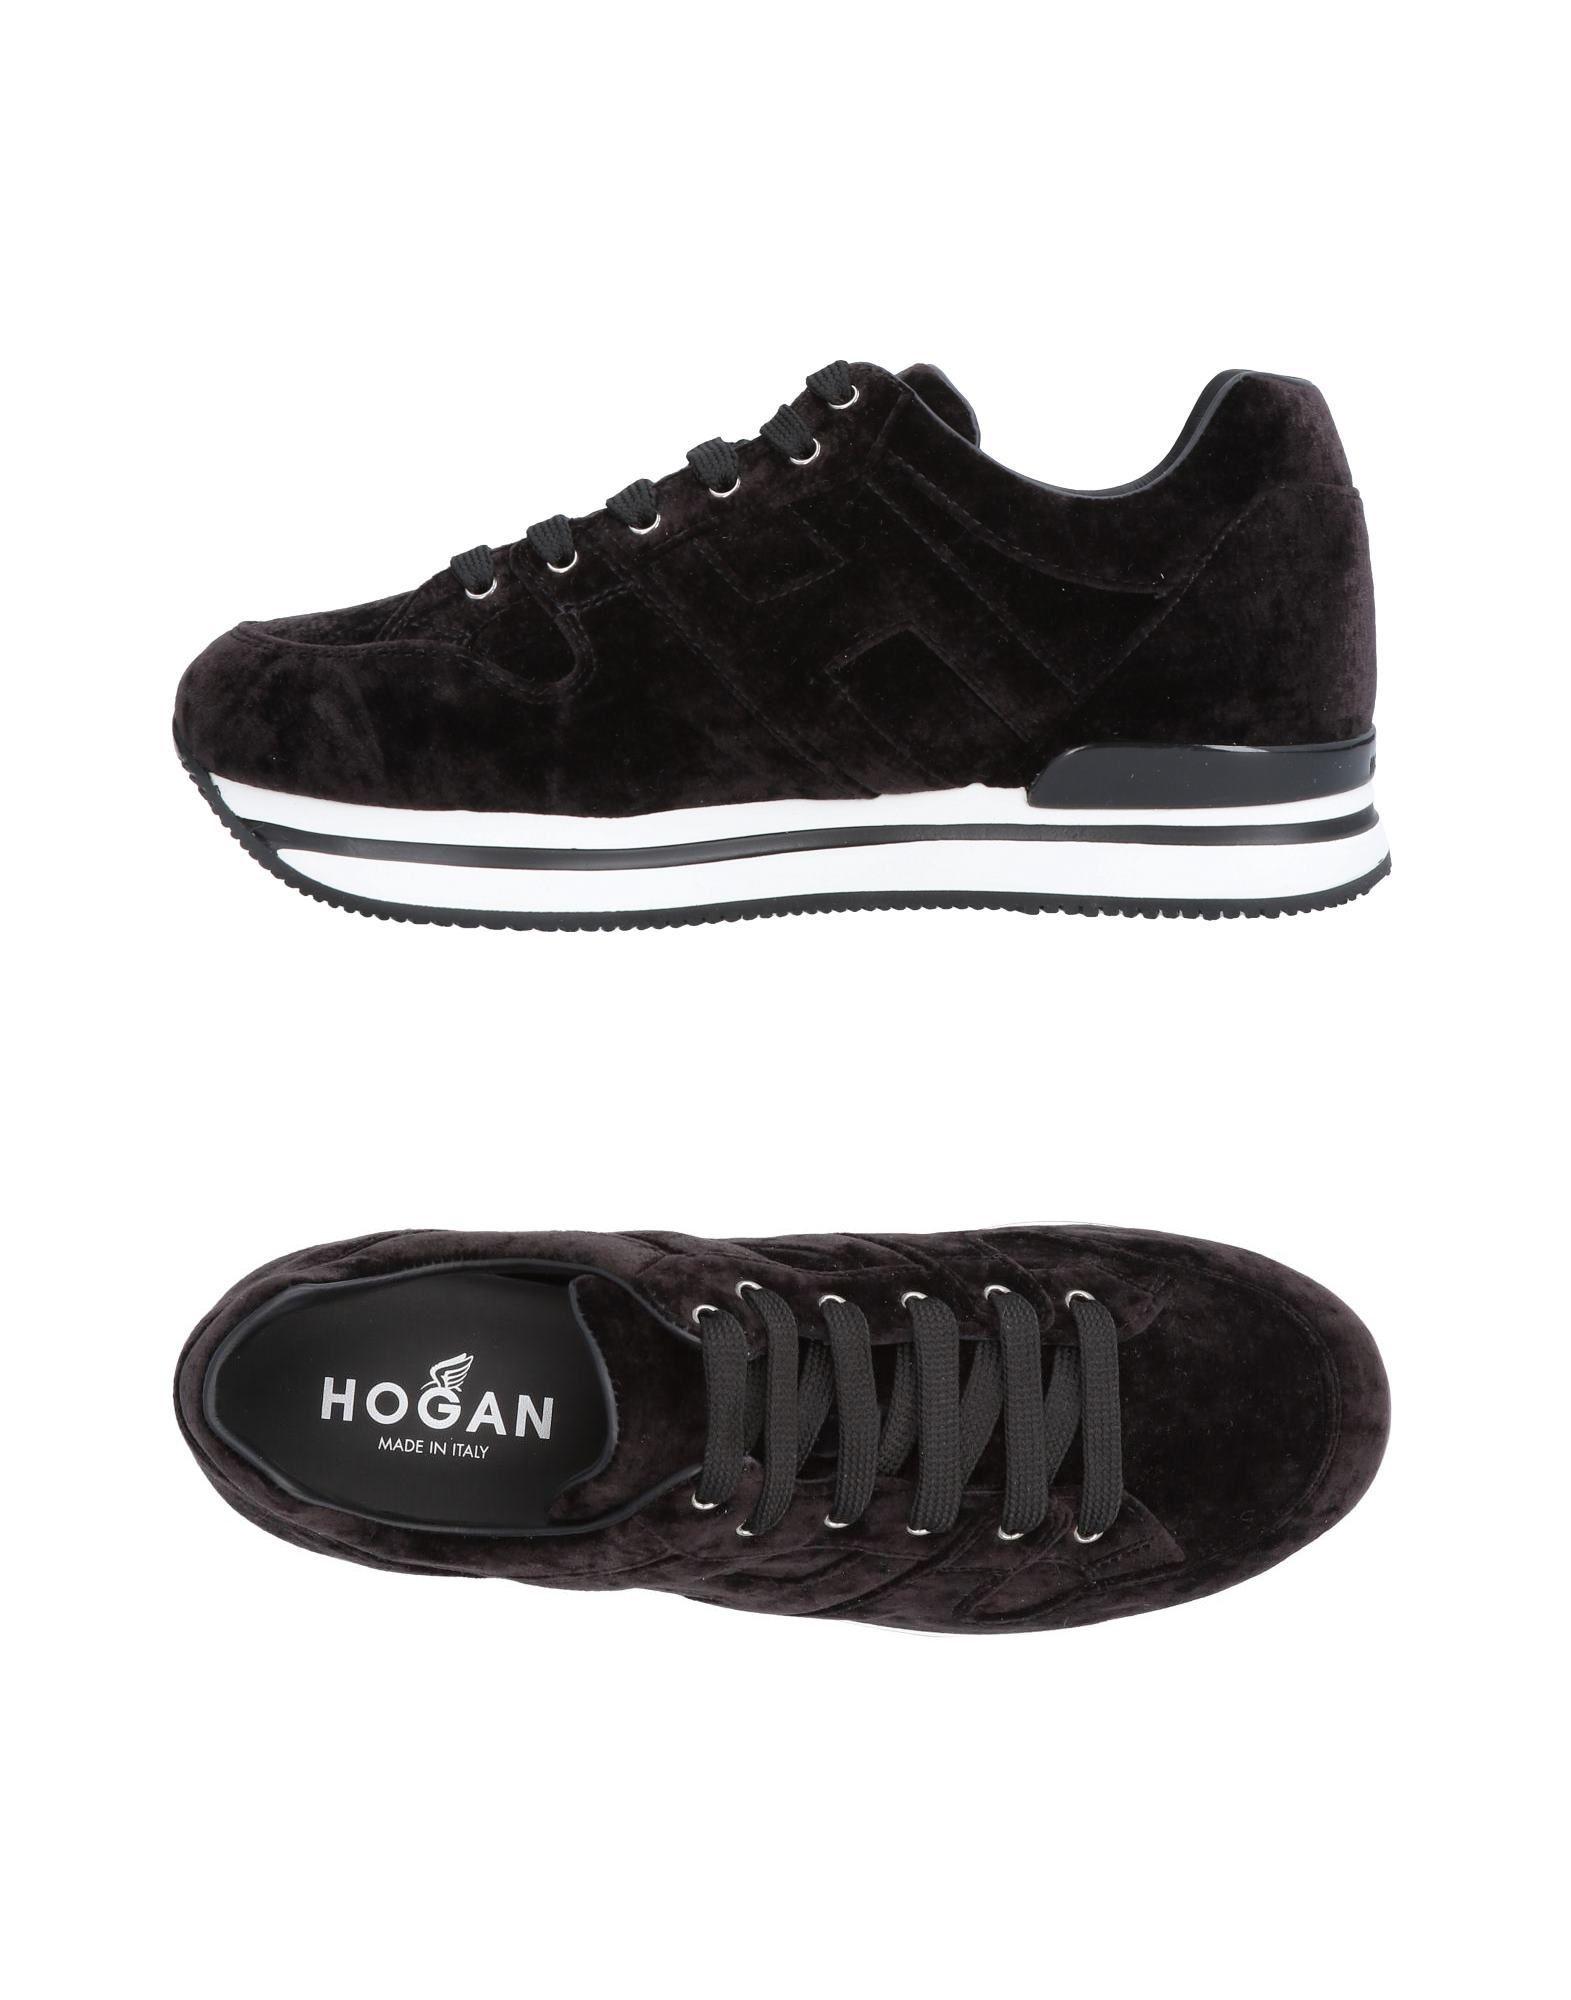 Baskets Hogan Femme - Baskets Hogan Noir Chaussures femme pas cher homme et femme